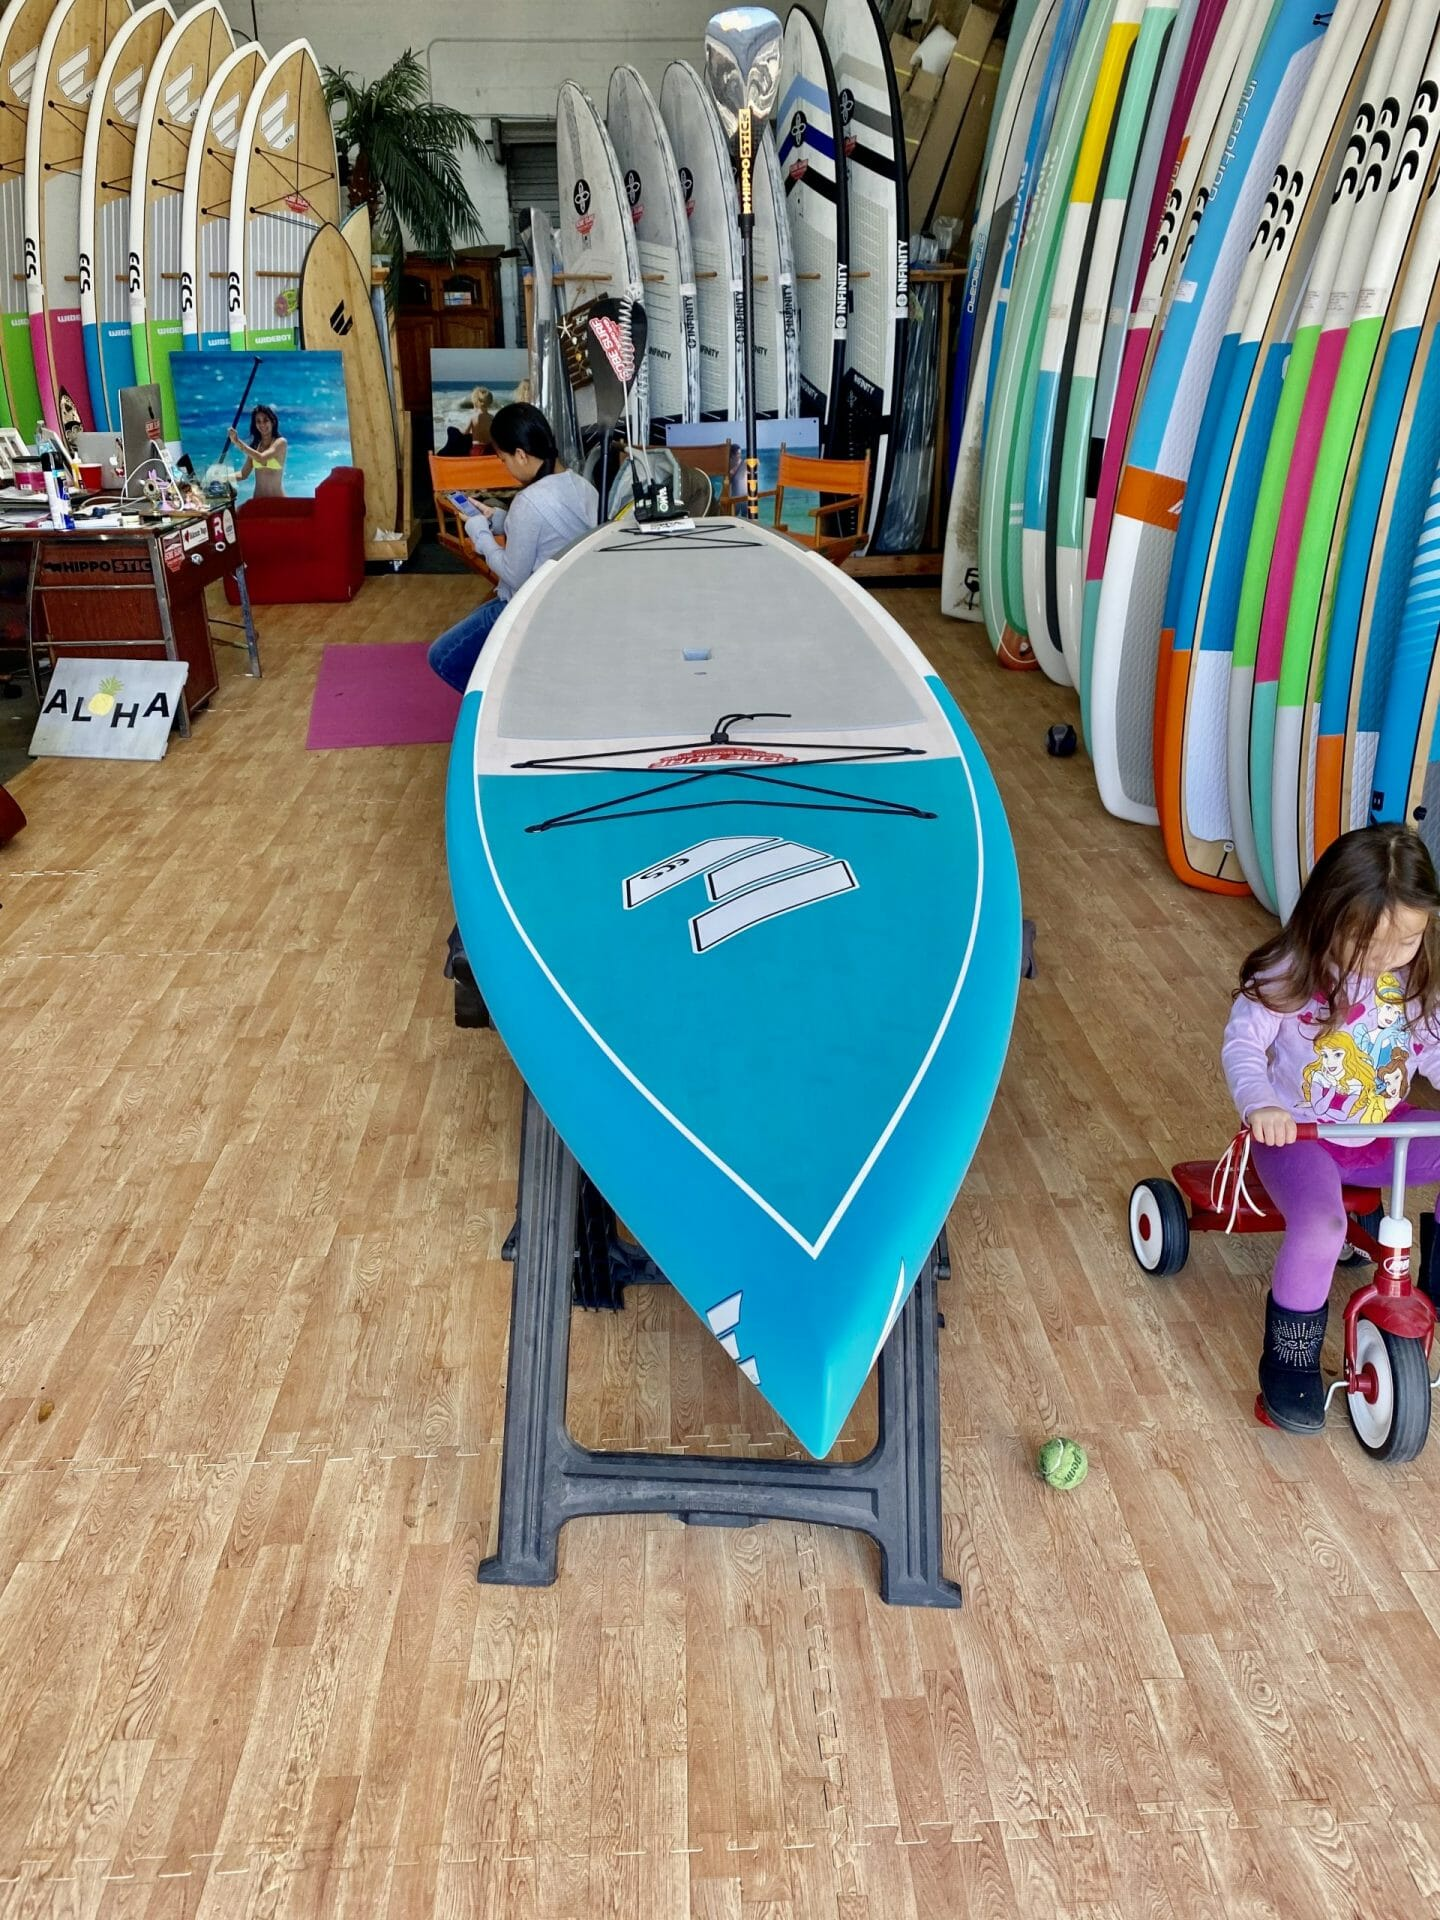 SoBe Surf Paddle Board Shop Florida Cocoa Beach Merritt Island Miami Owner Girard Middleton's daughter Audrey